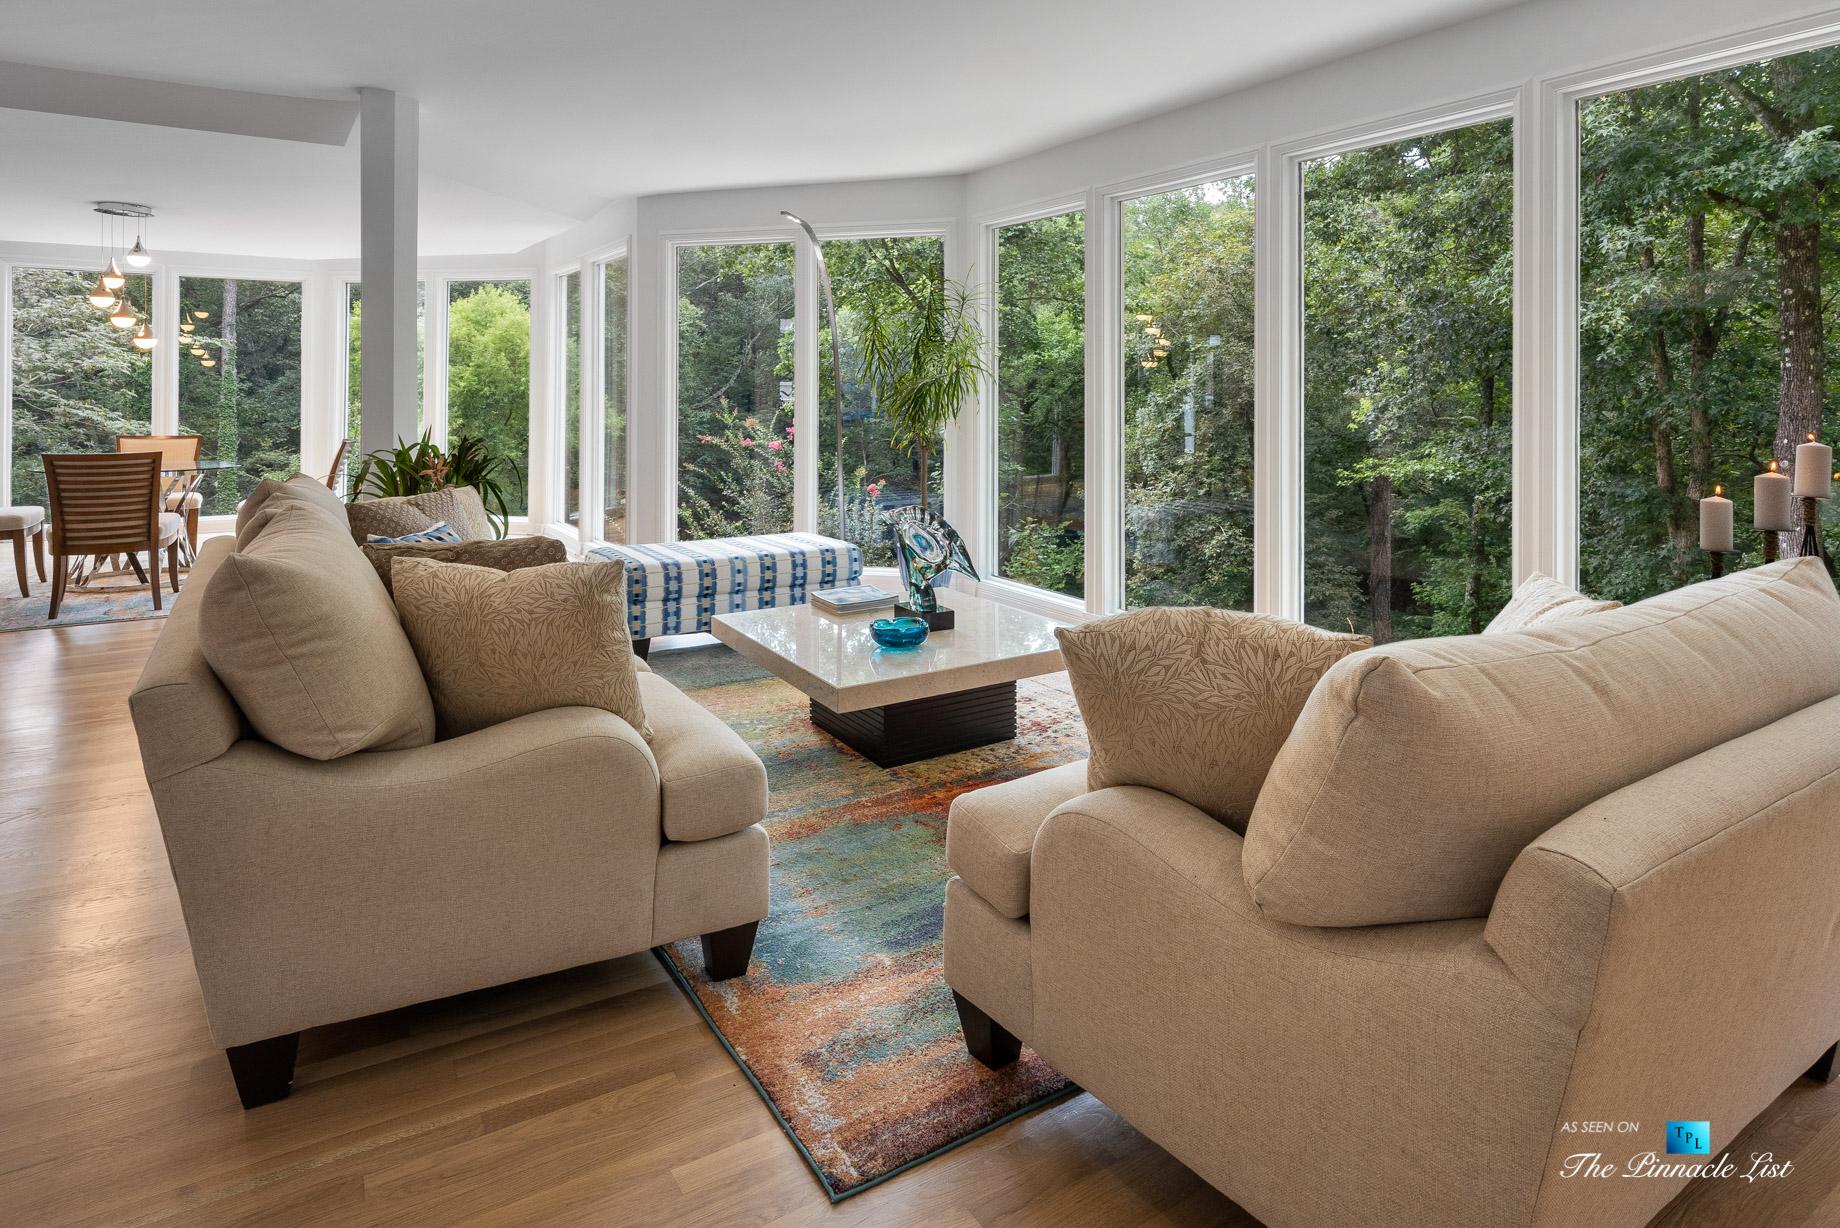 3906 Paces Ferry Rd NW, Atlanta, GA, USA – Living Room Window View – Luxury Real Estate – Buckhead Home